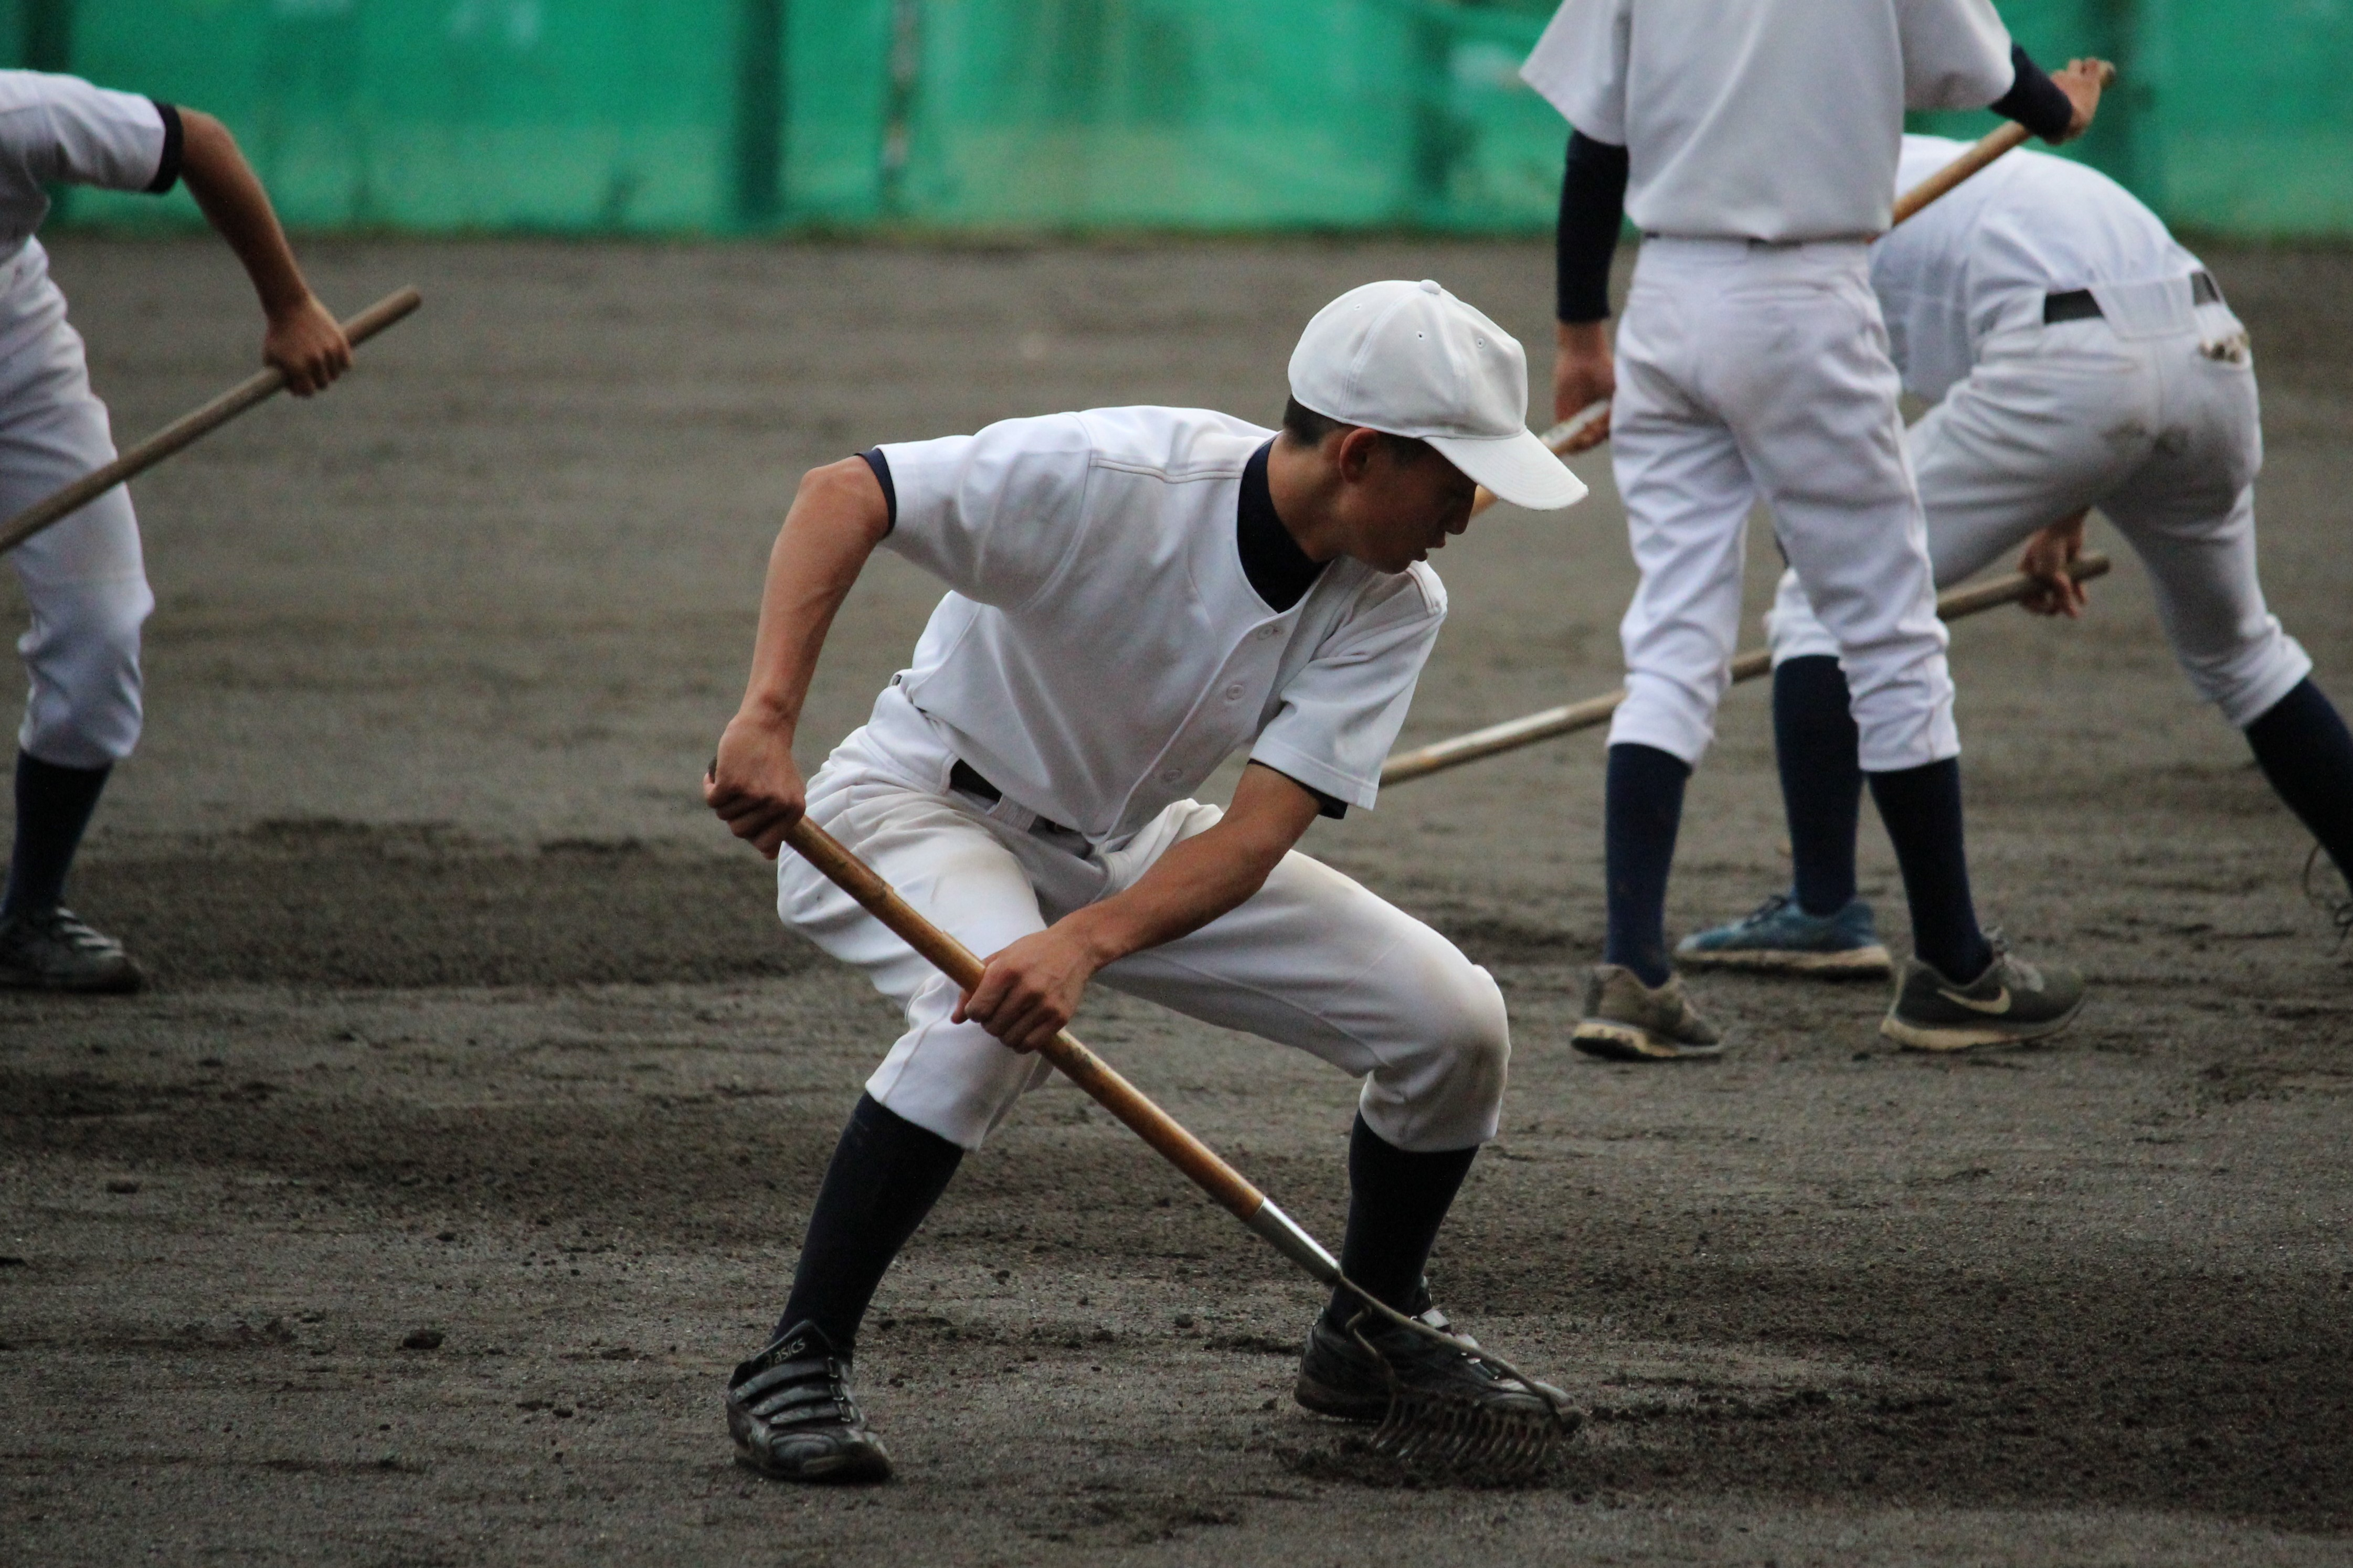 【立川 野球部】伝統の昼練習